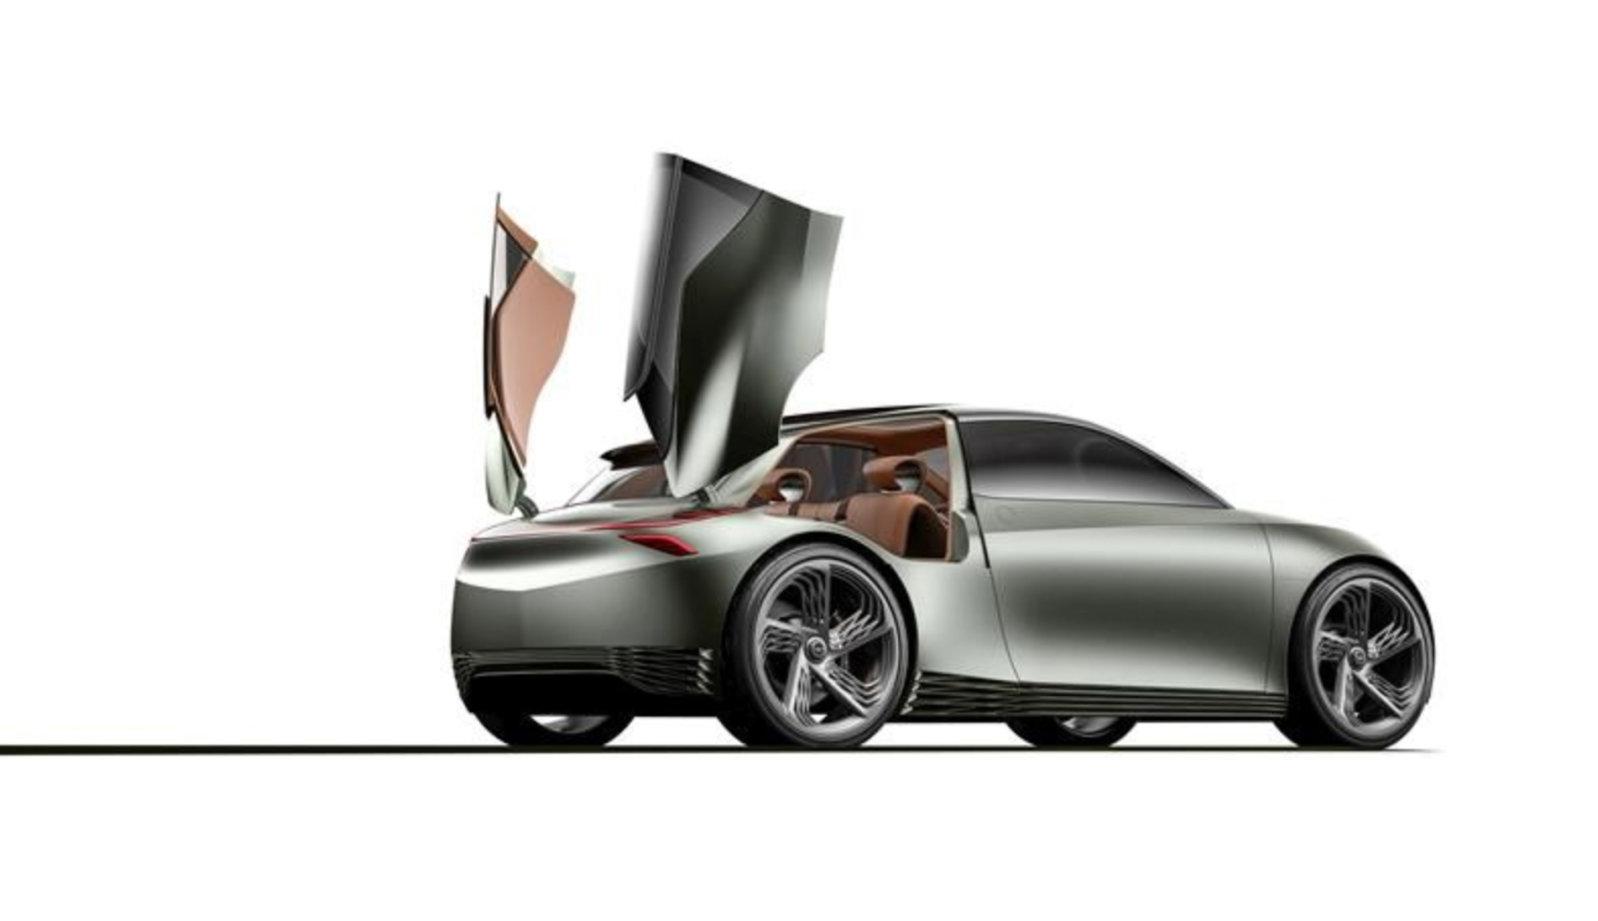 modny samochód